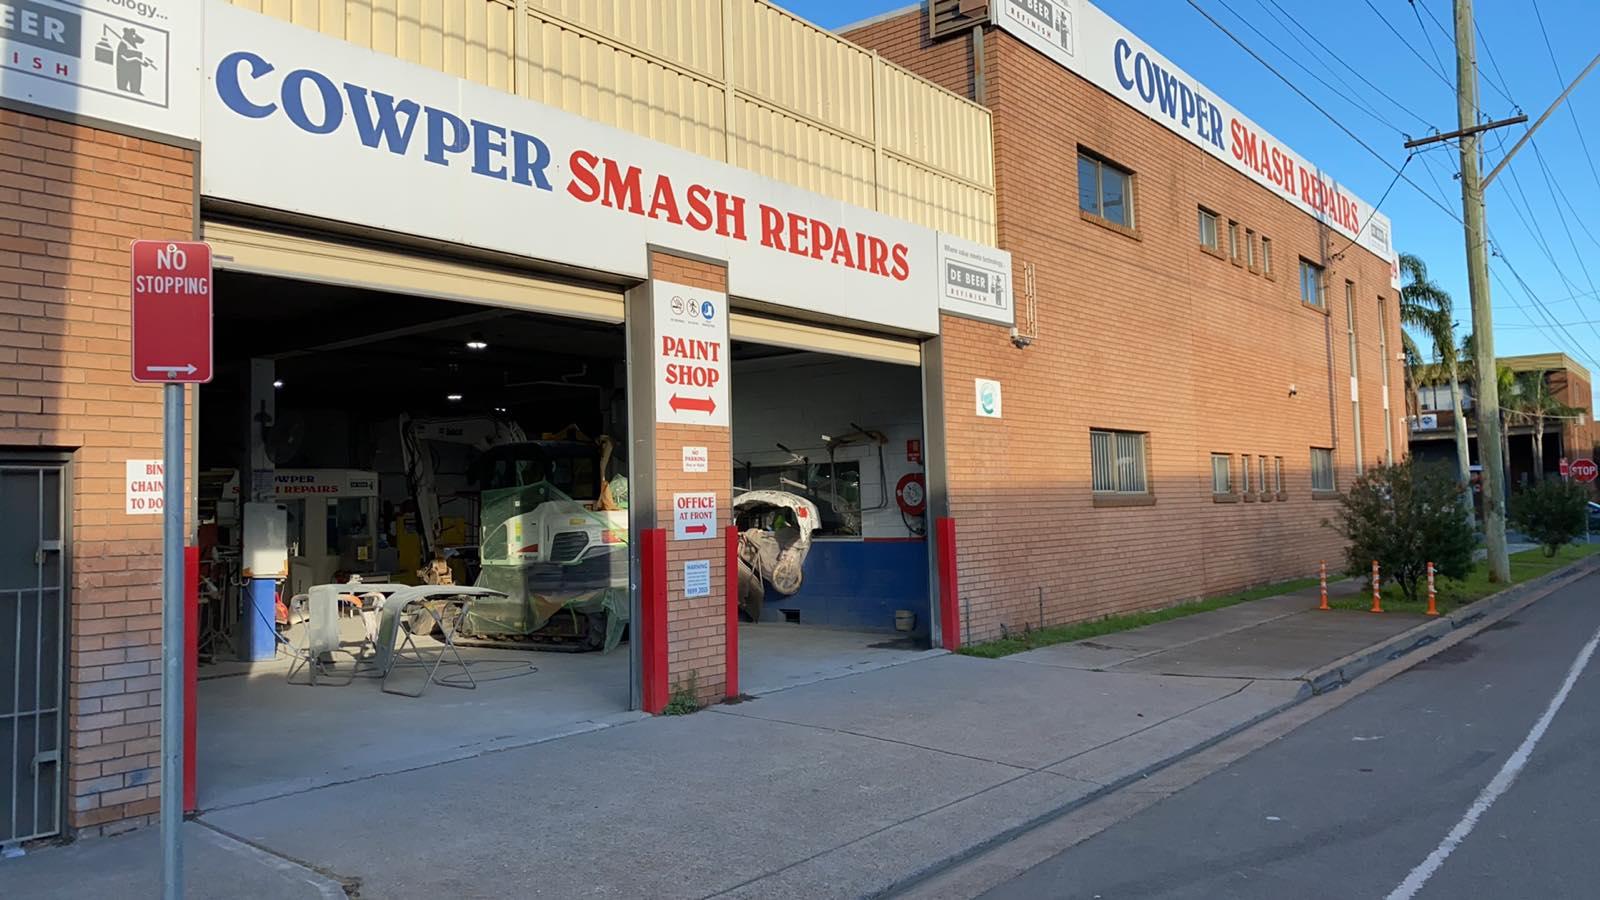 Cowper Smash Repairs  Photos